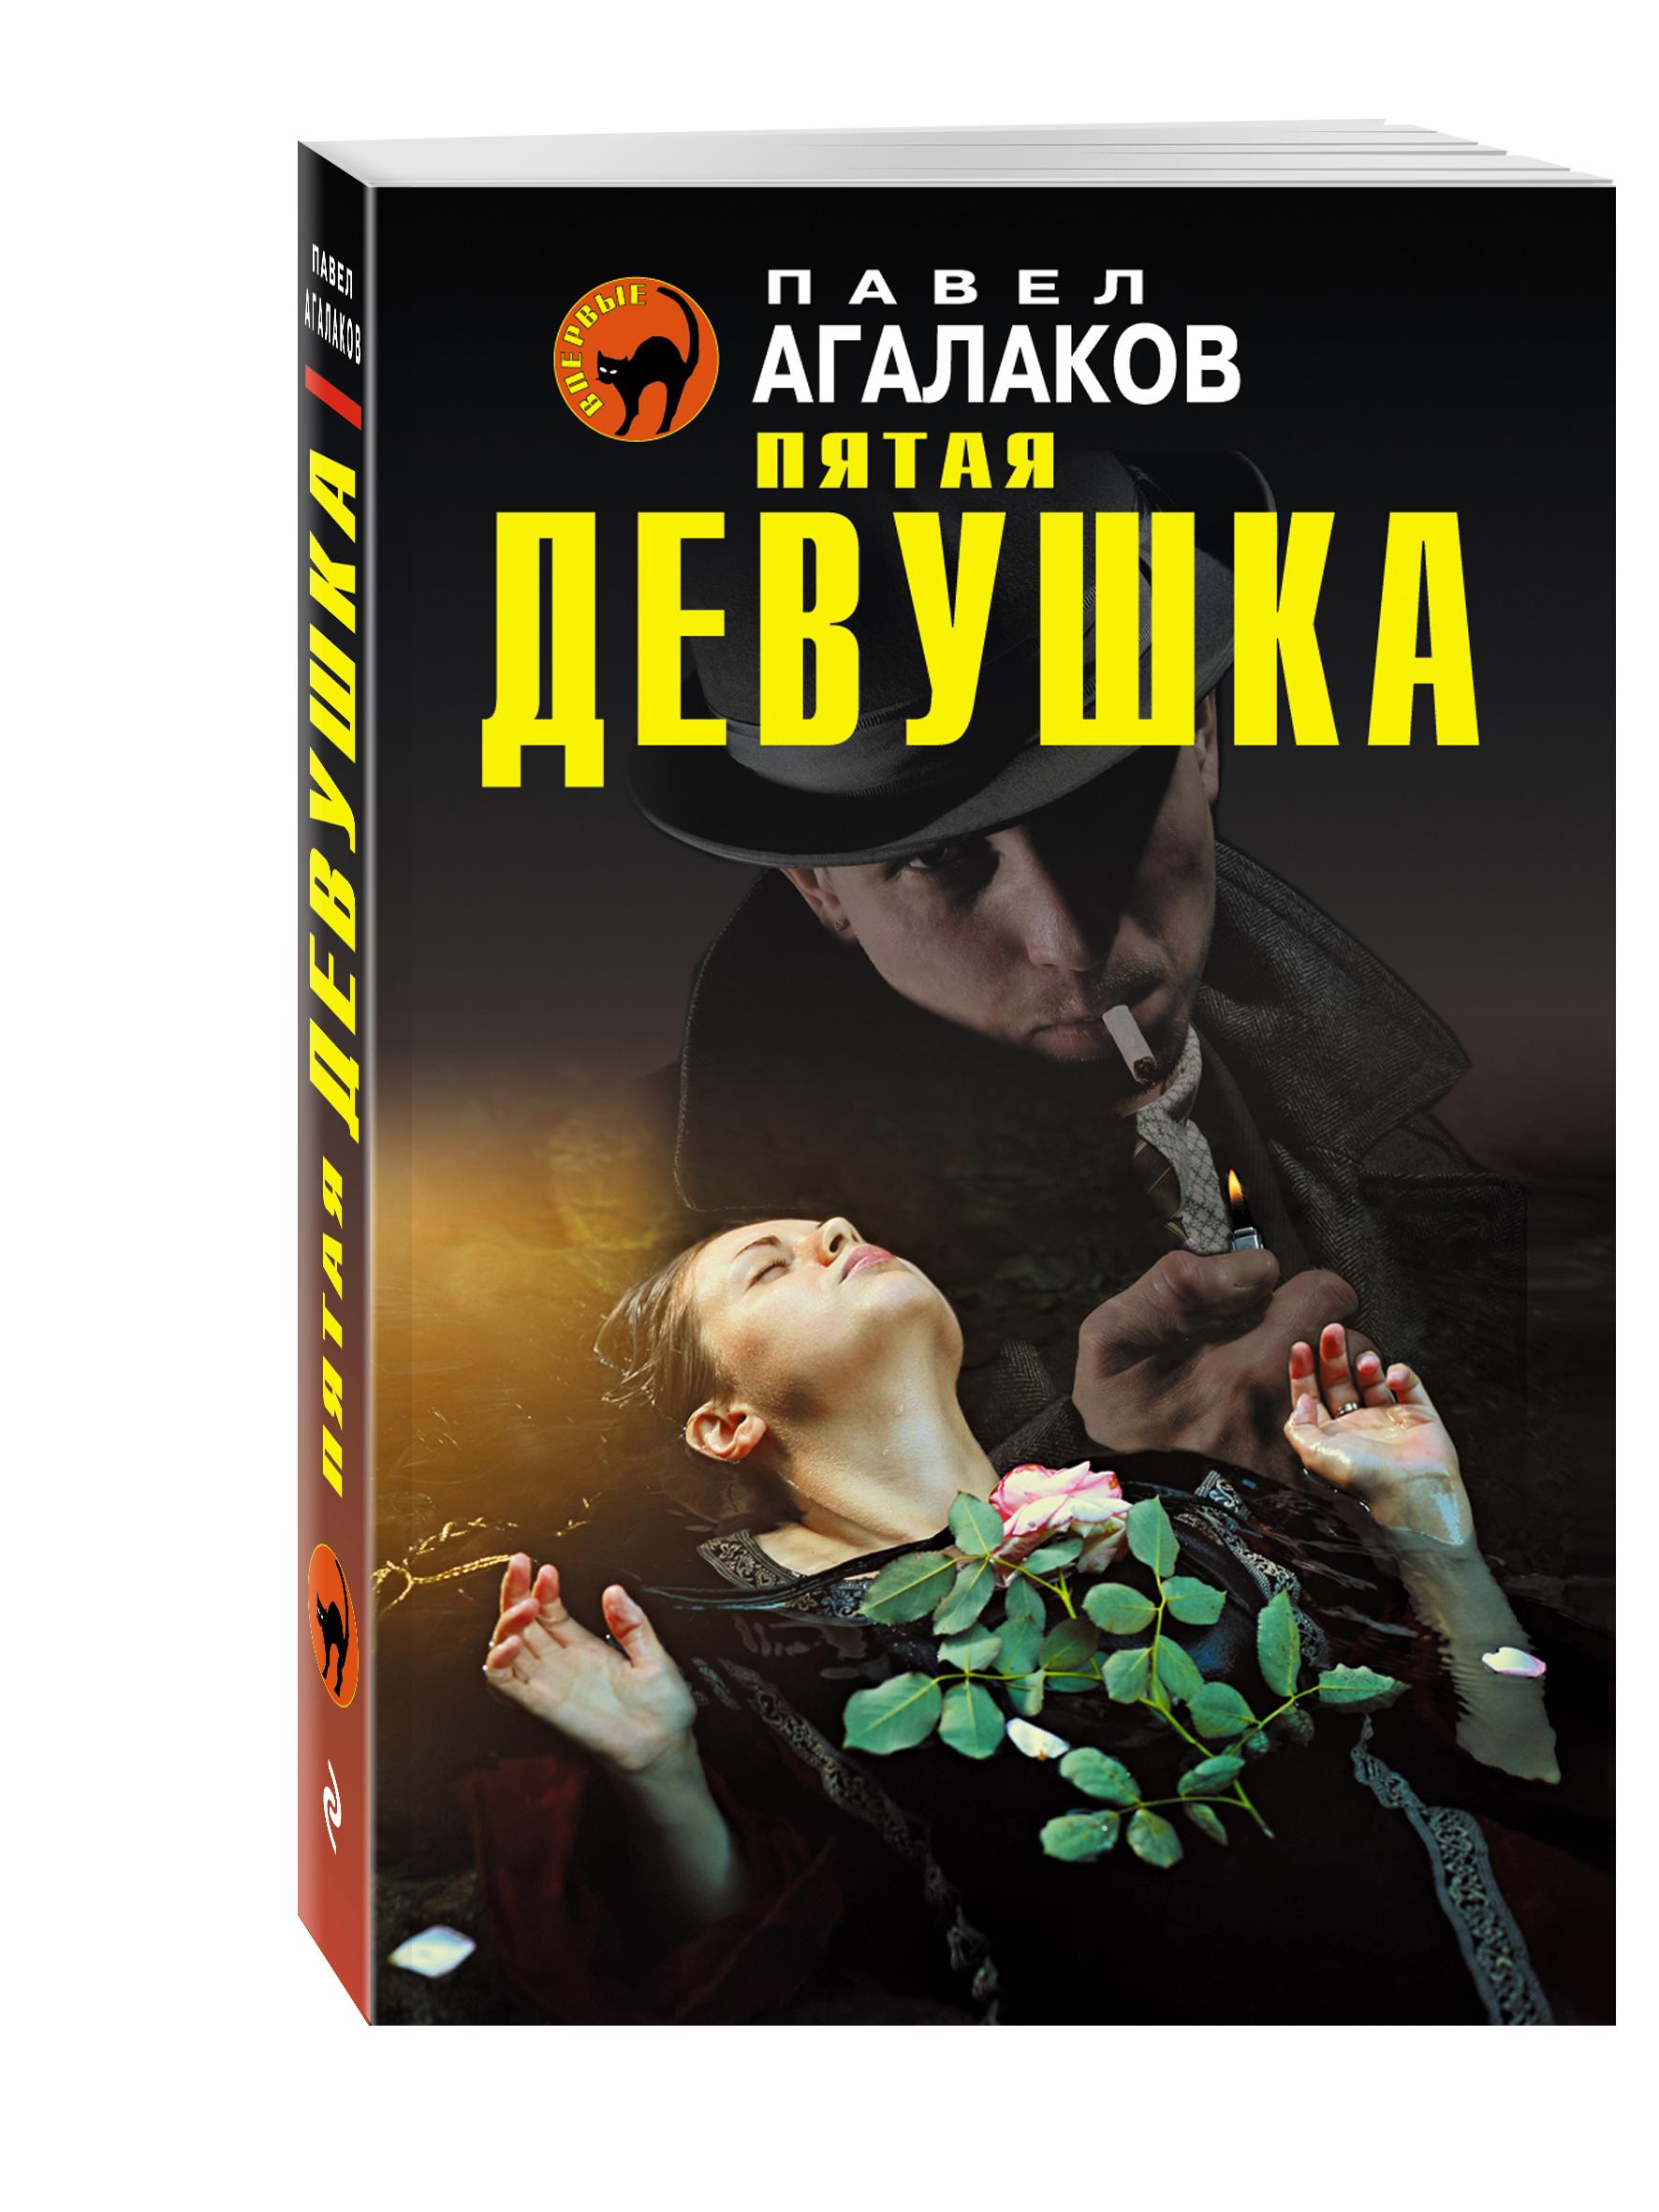 Павел Агалаков Пятая девушка sistema шейкер to go 700 мл 9 3х9х20 см цвета в ассортименте 21378 sistema